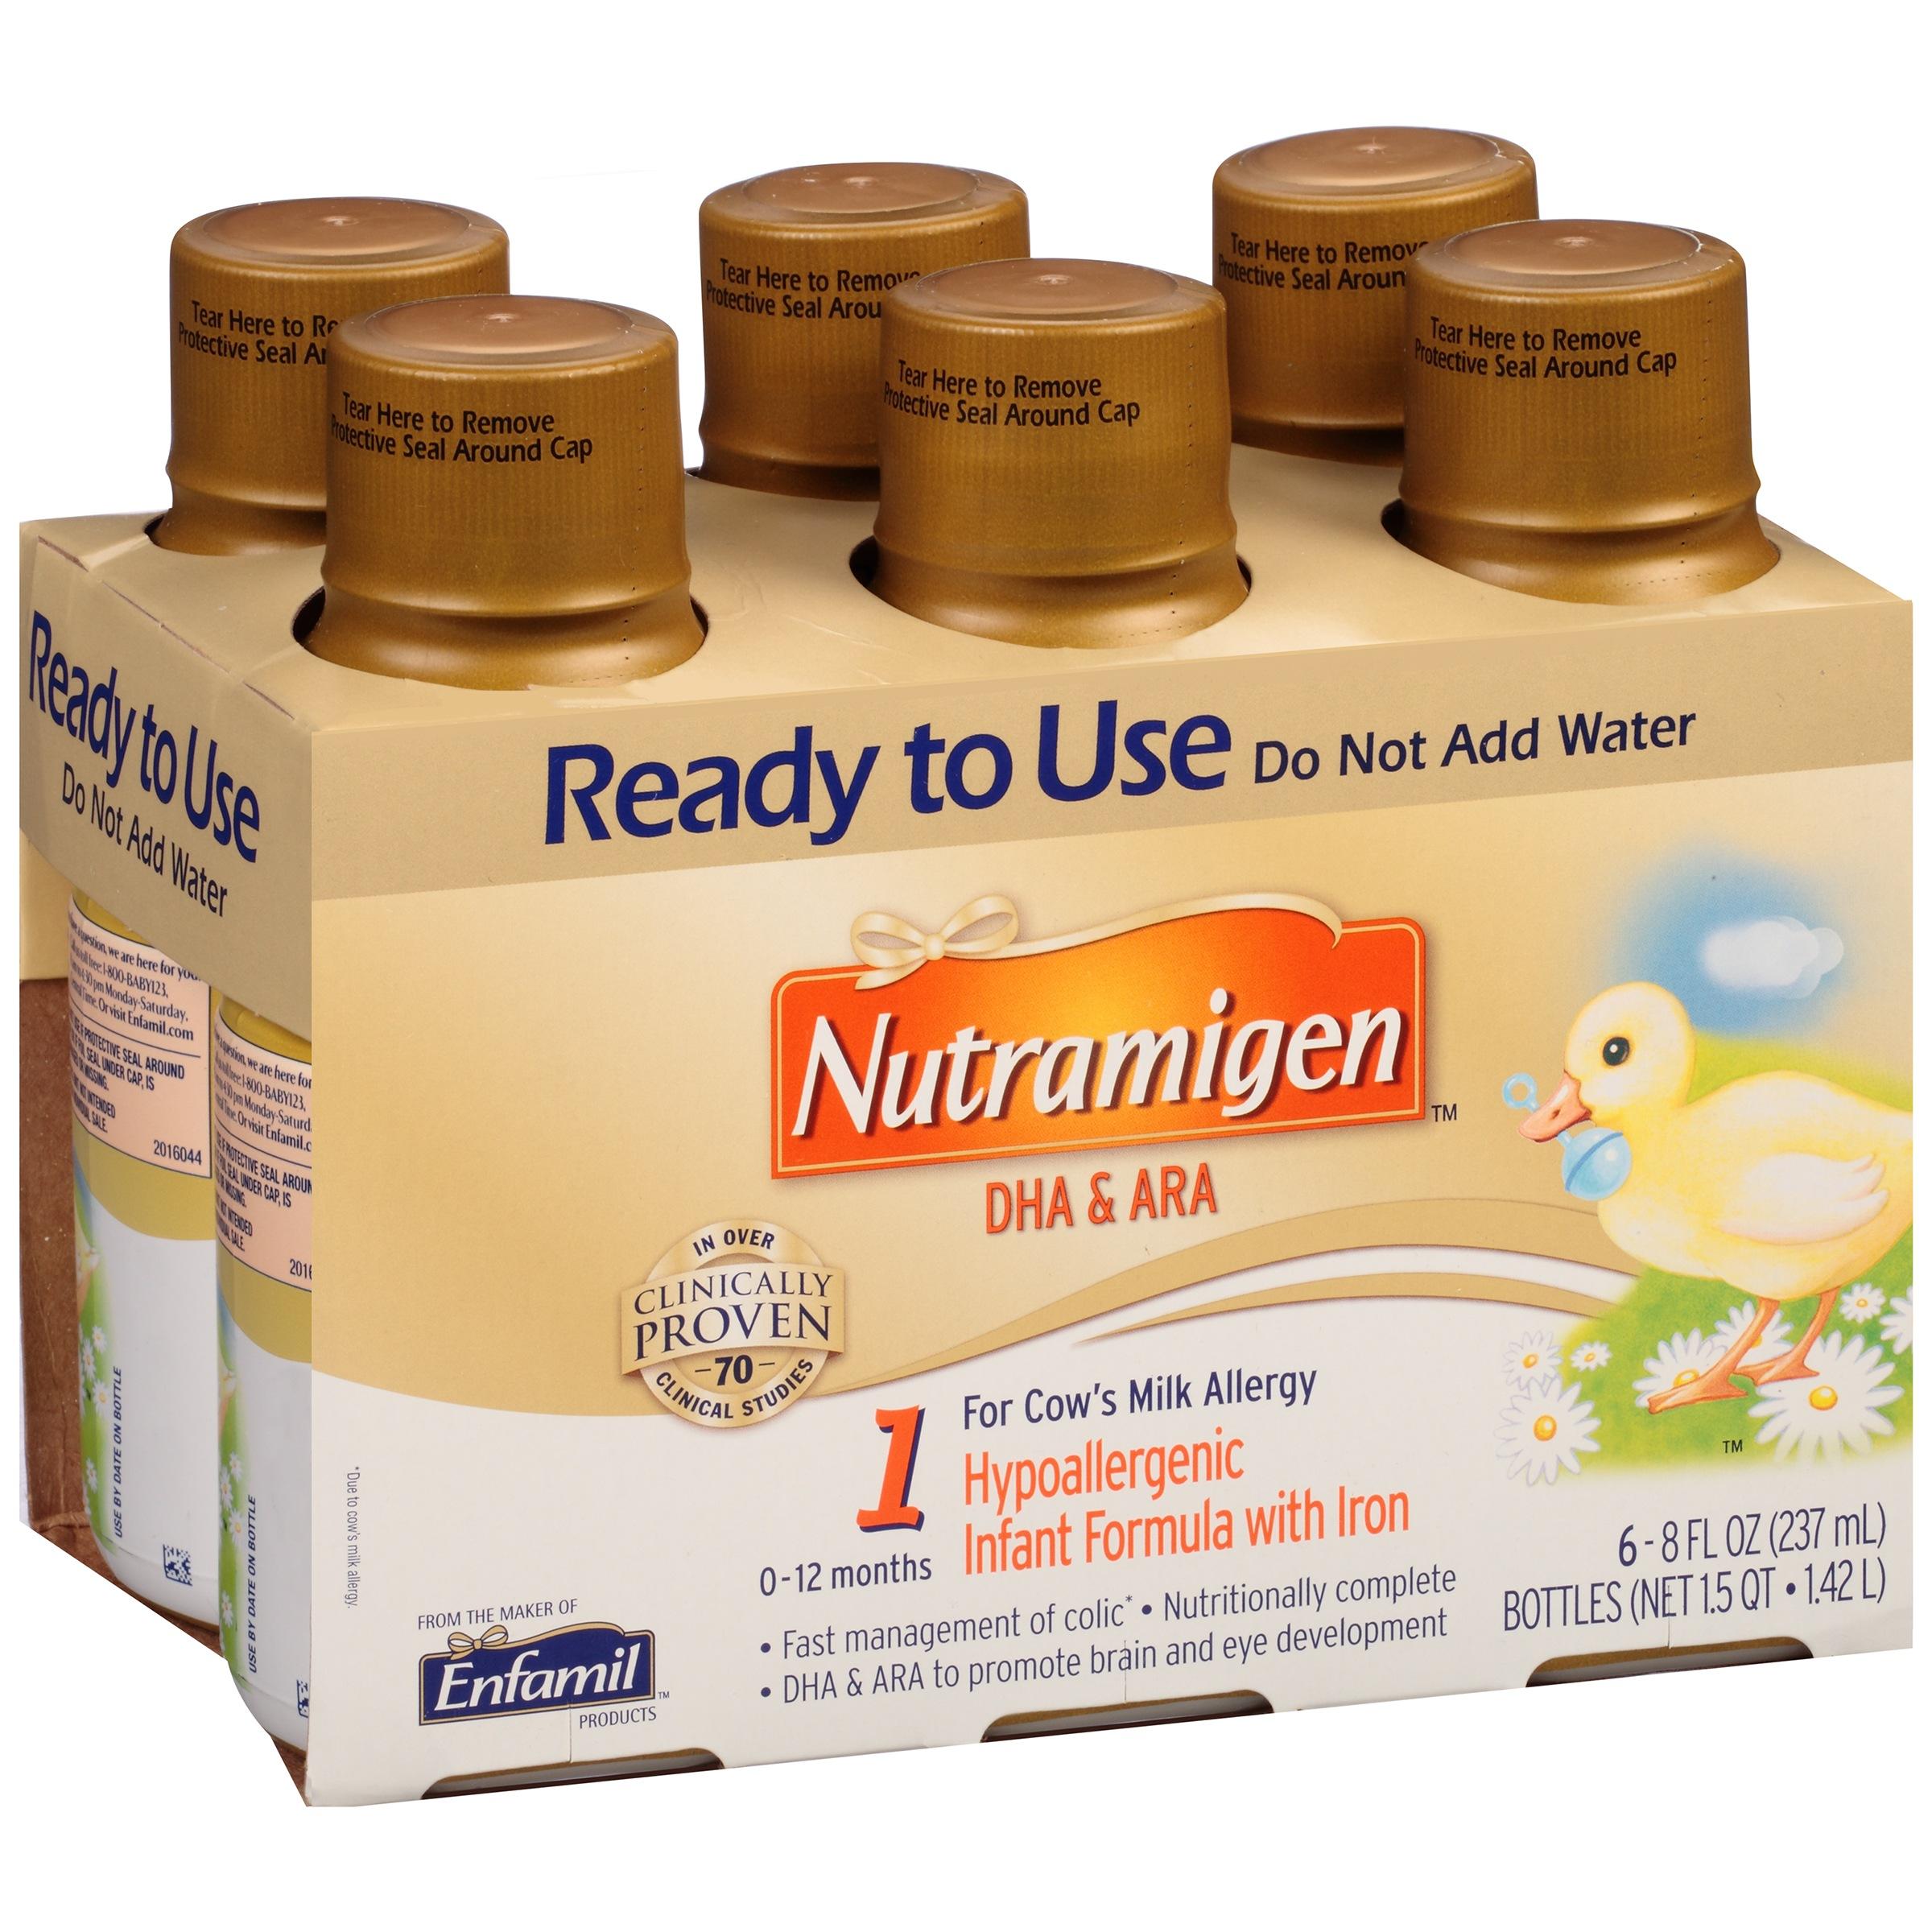 Nutramigen Hypoallergenic Ready to Use Infant Formula 6-8 fl. oz. Bottles